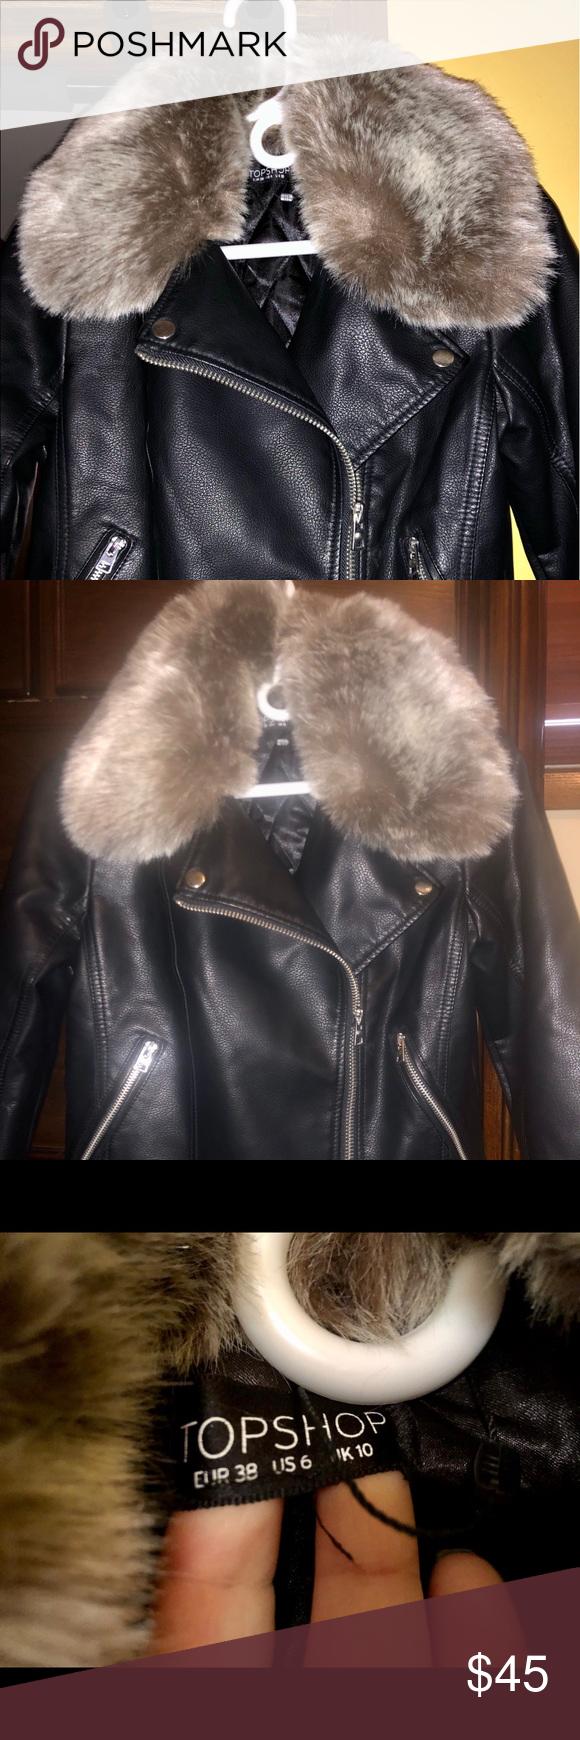 Moto Jacket with Fur Collar Fur collars